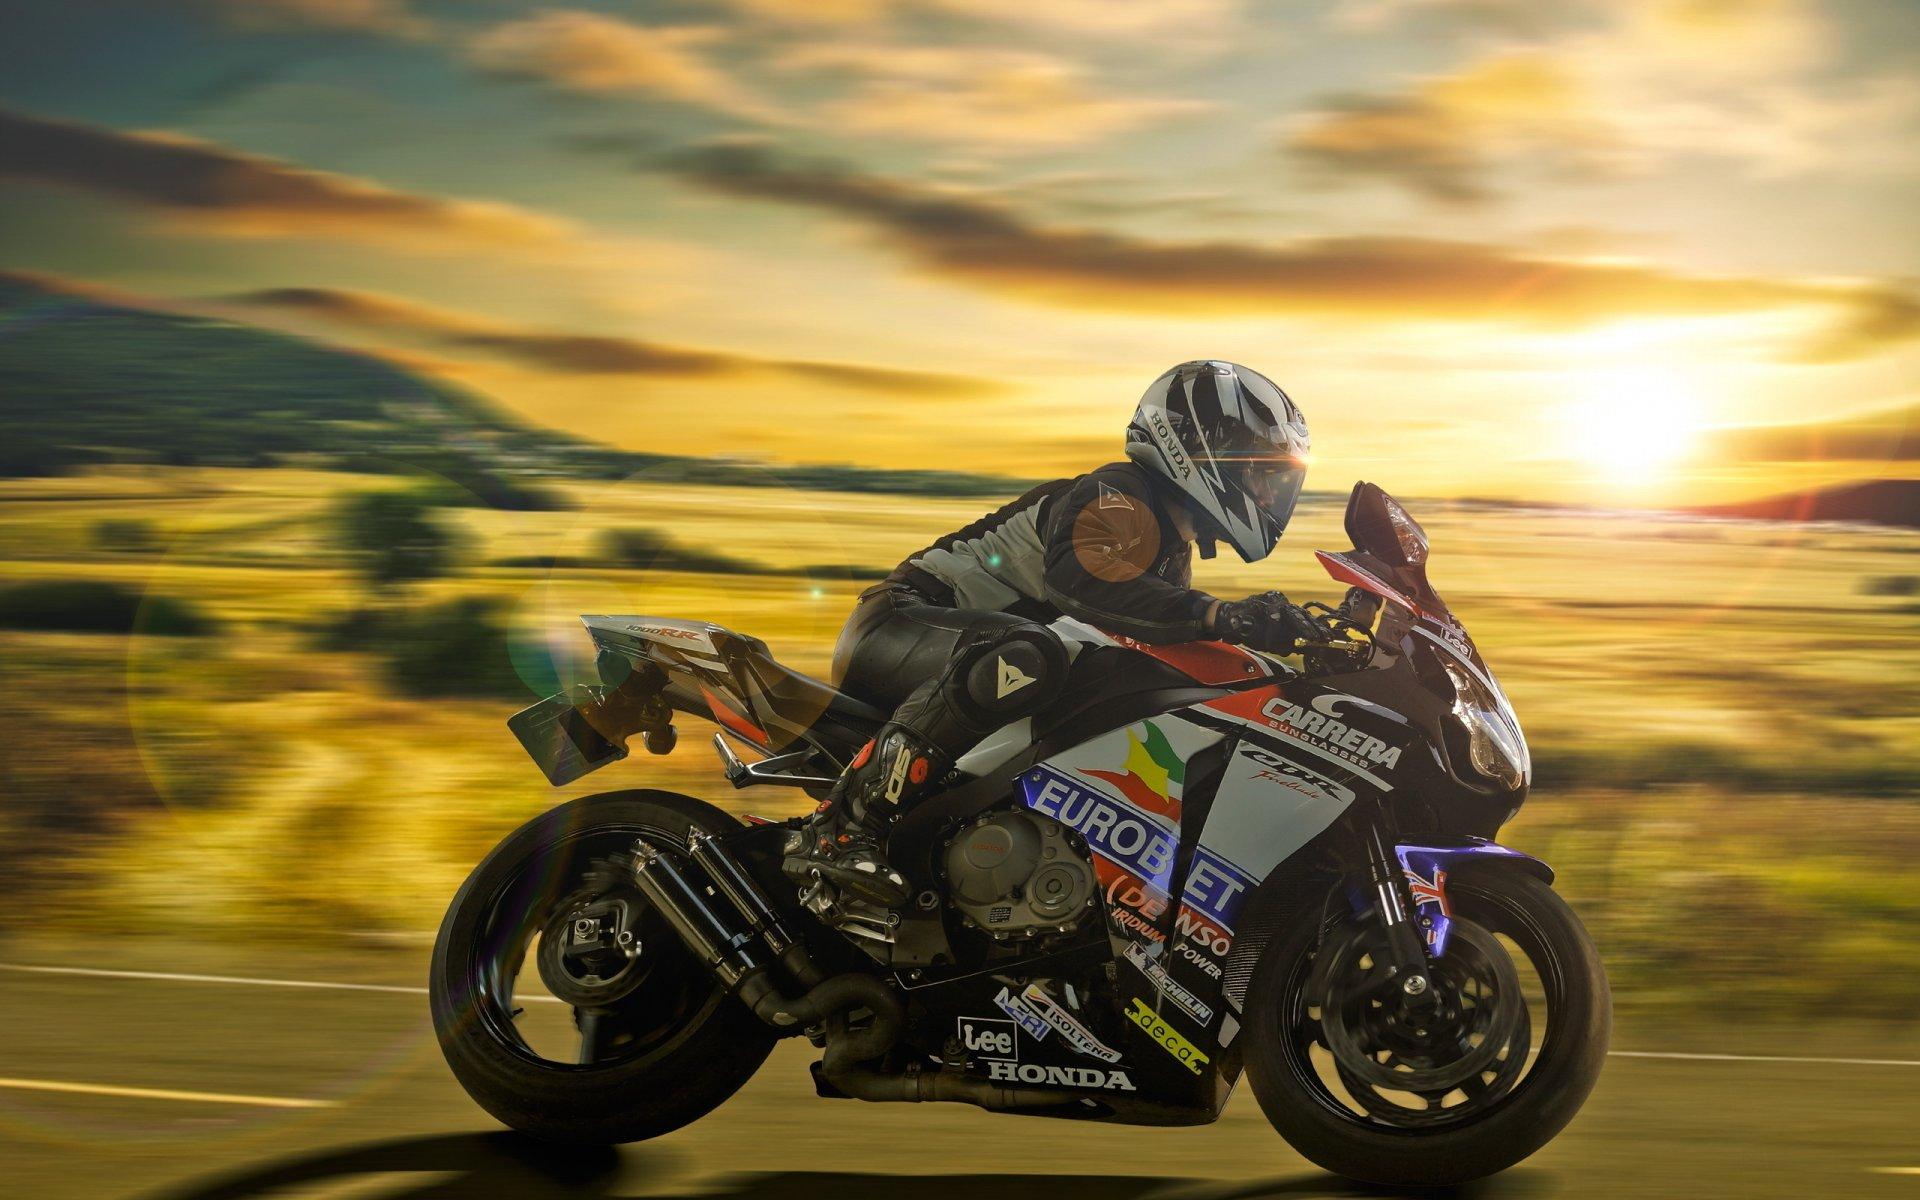 Обои мотоциклист, гонка. Мотоциклы foto 6